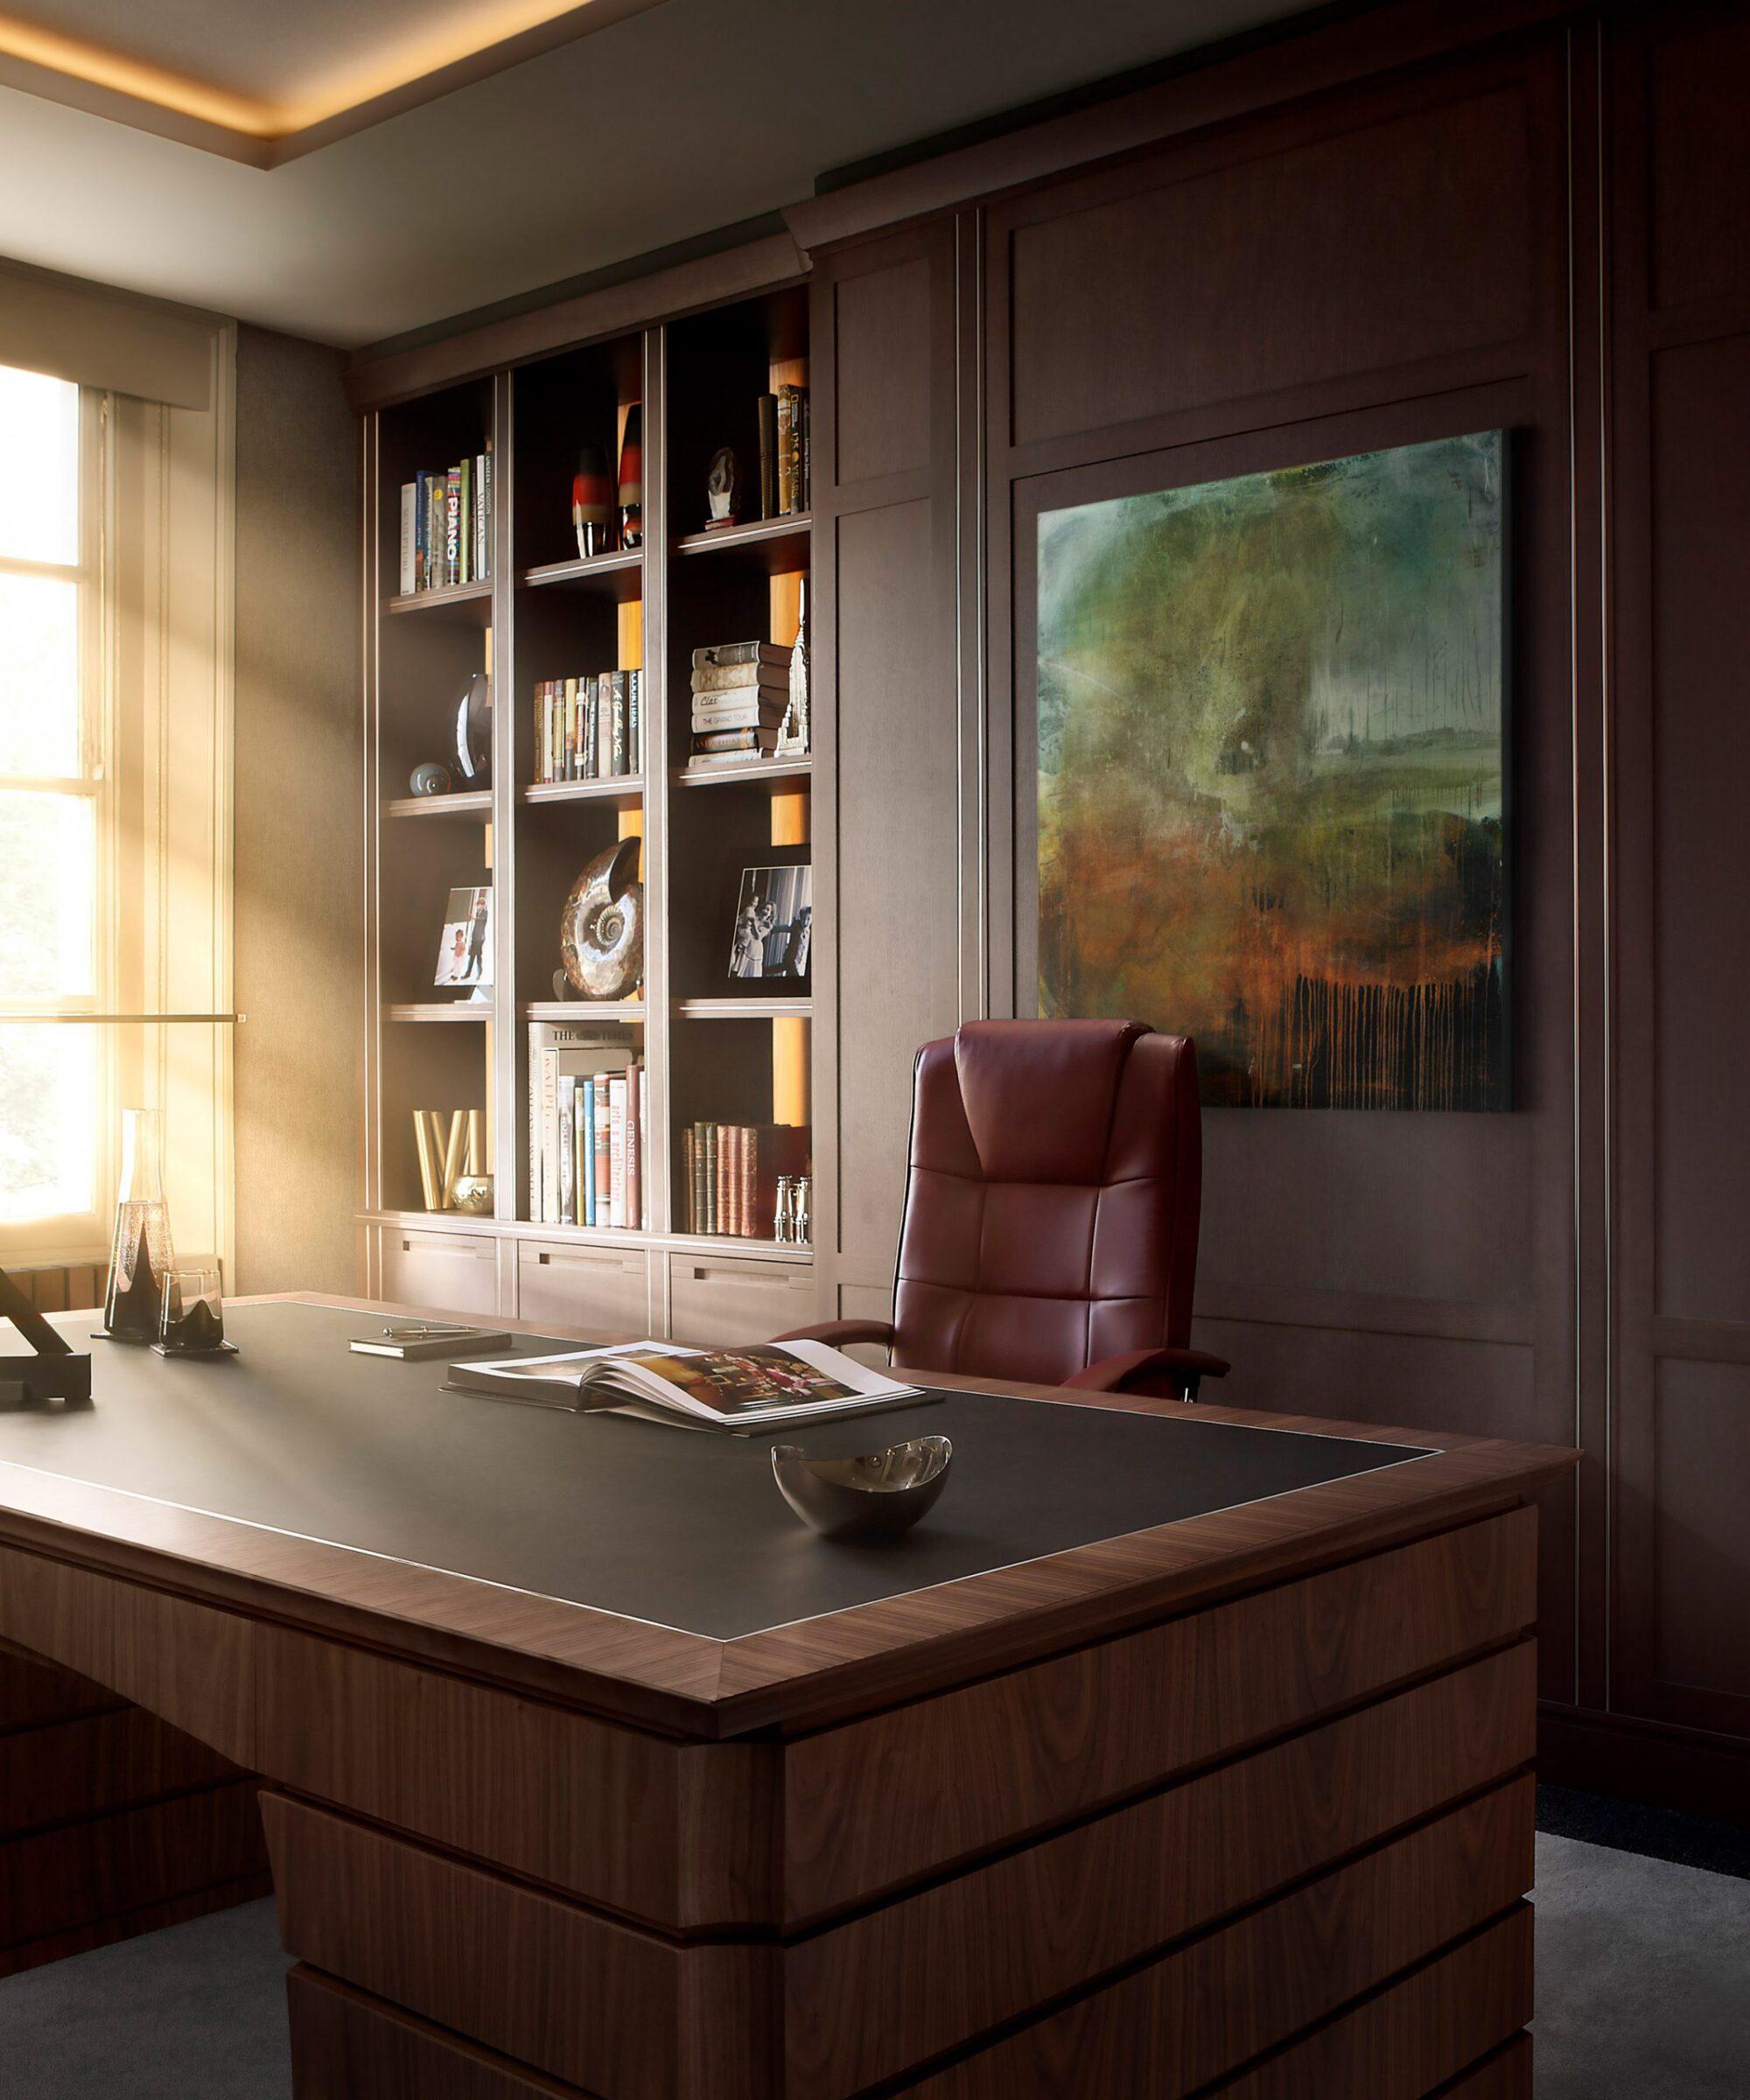 High end home furniture design by Smallbone